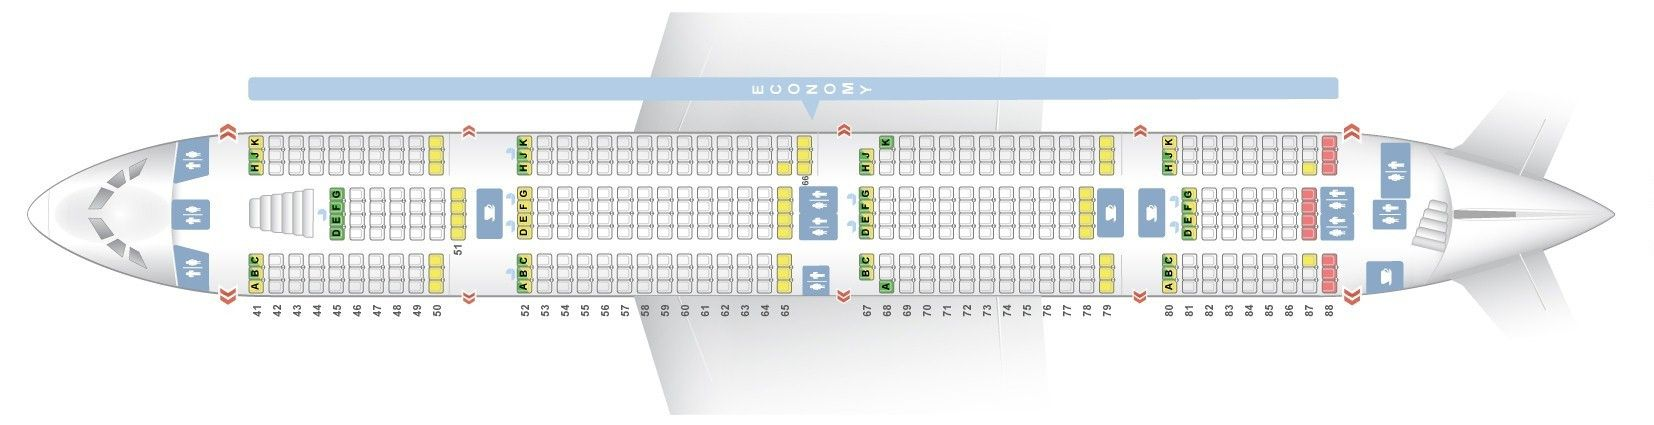 Emirates A380 Seat Map 50 emirates flight seat layout jl0x